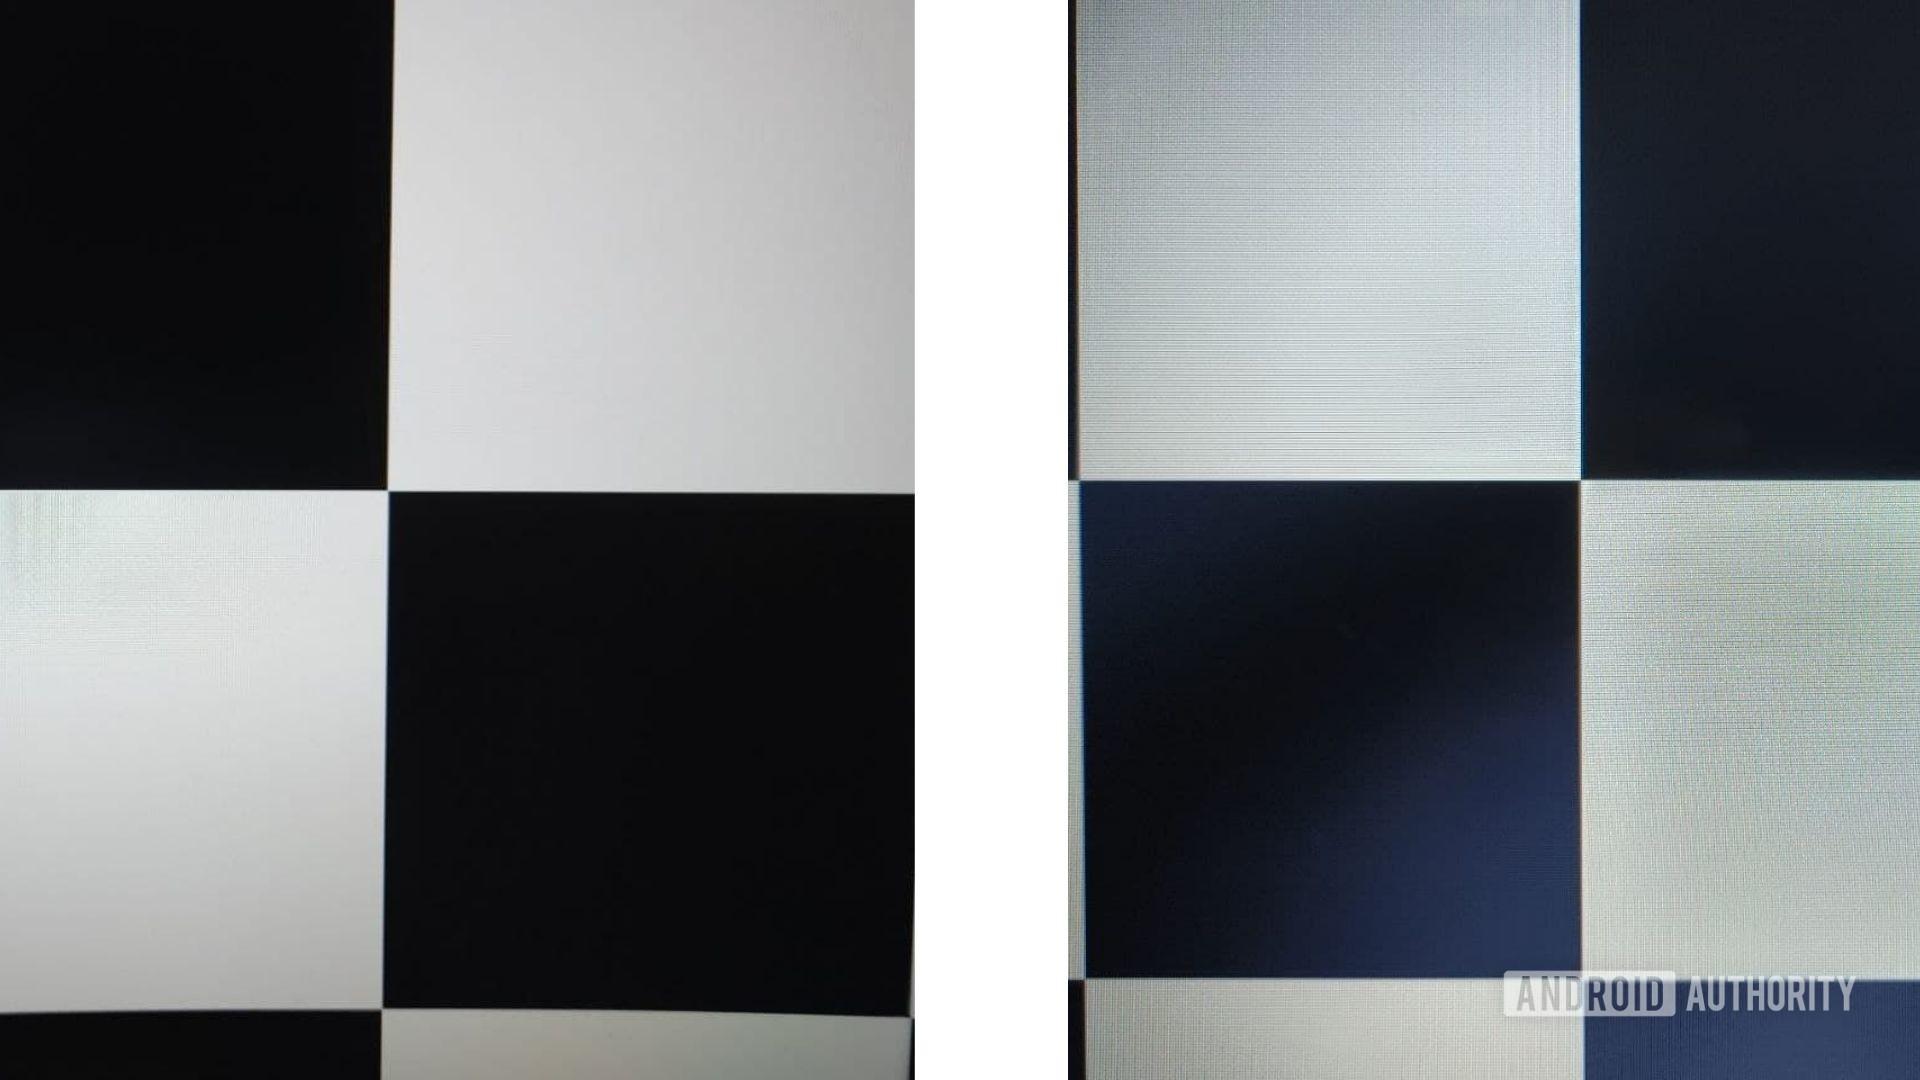 contrast ratio checkerboard test